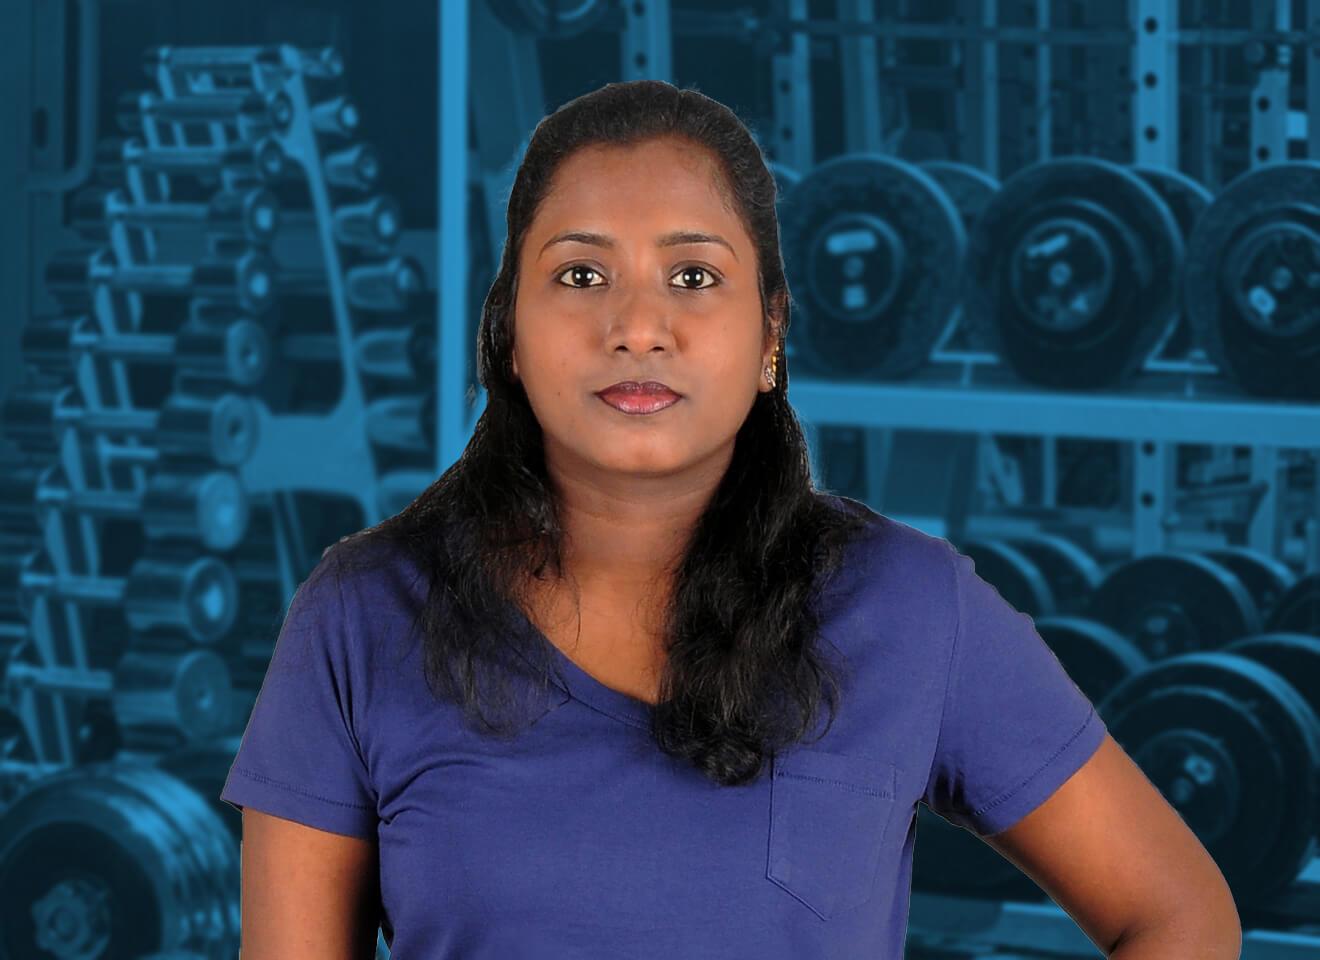 Lavanya Vadana Pratheeba